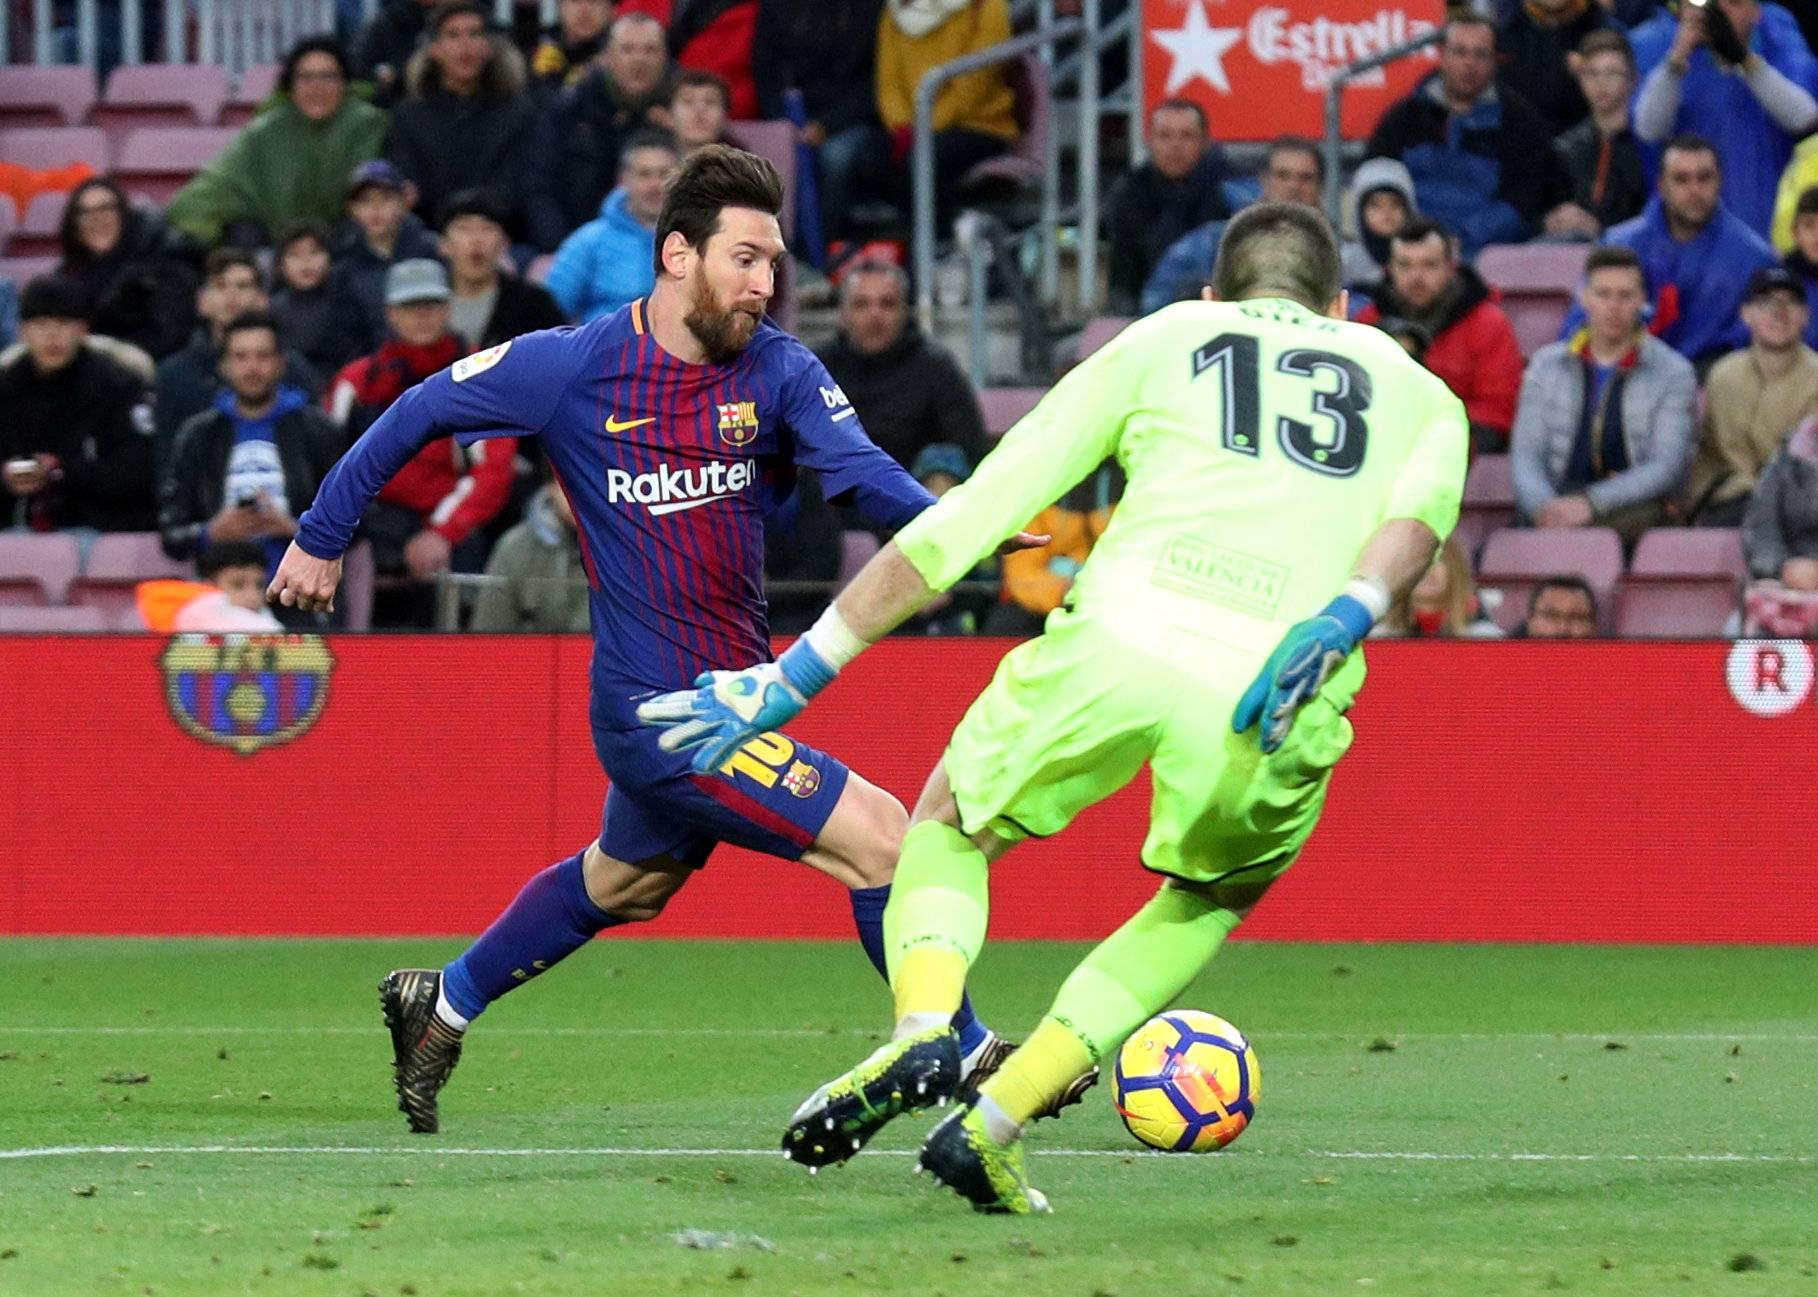 La Liga Santander - Barcelona vs Levante